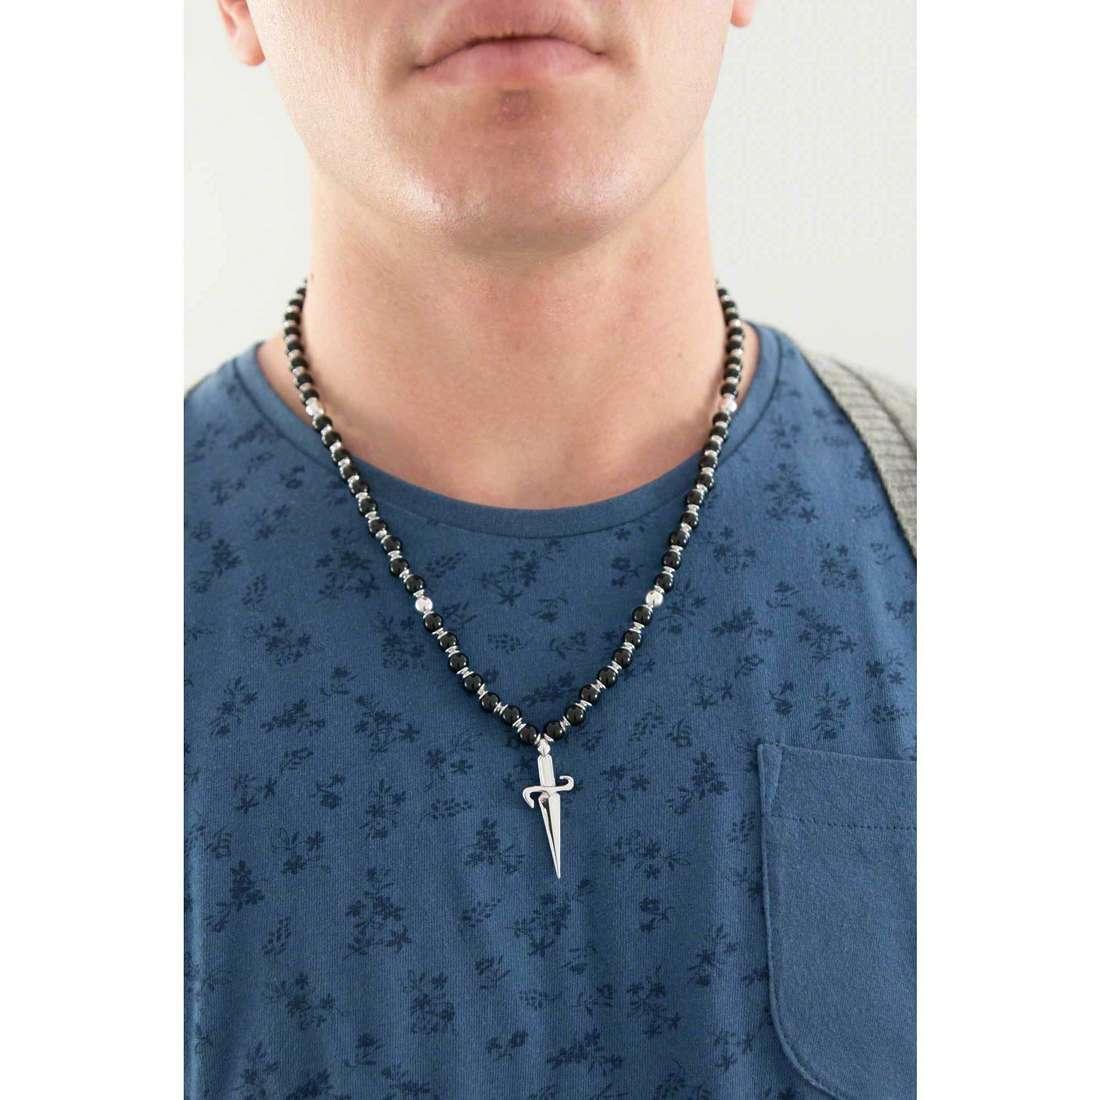 Cesare Paciotti necklaces man JPCL0191B indosso